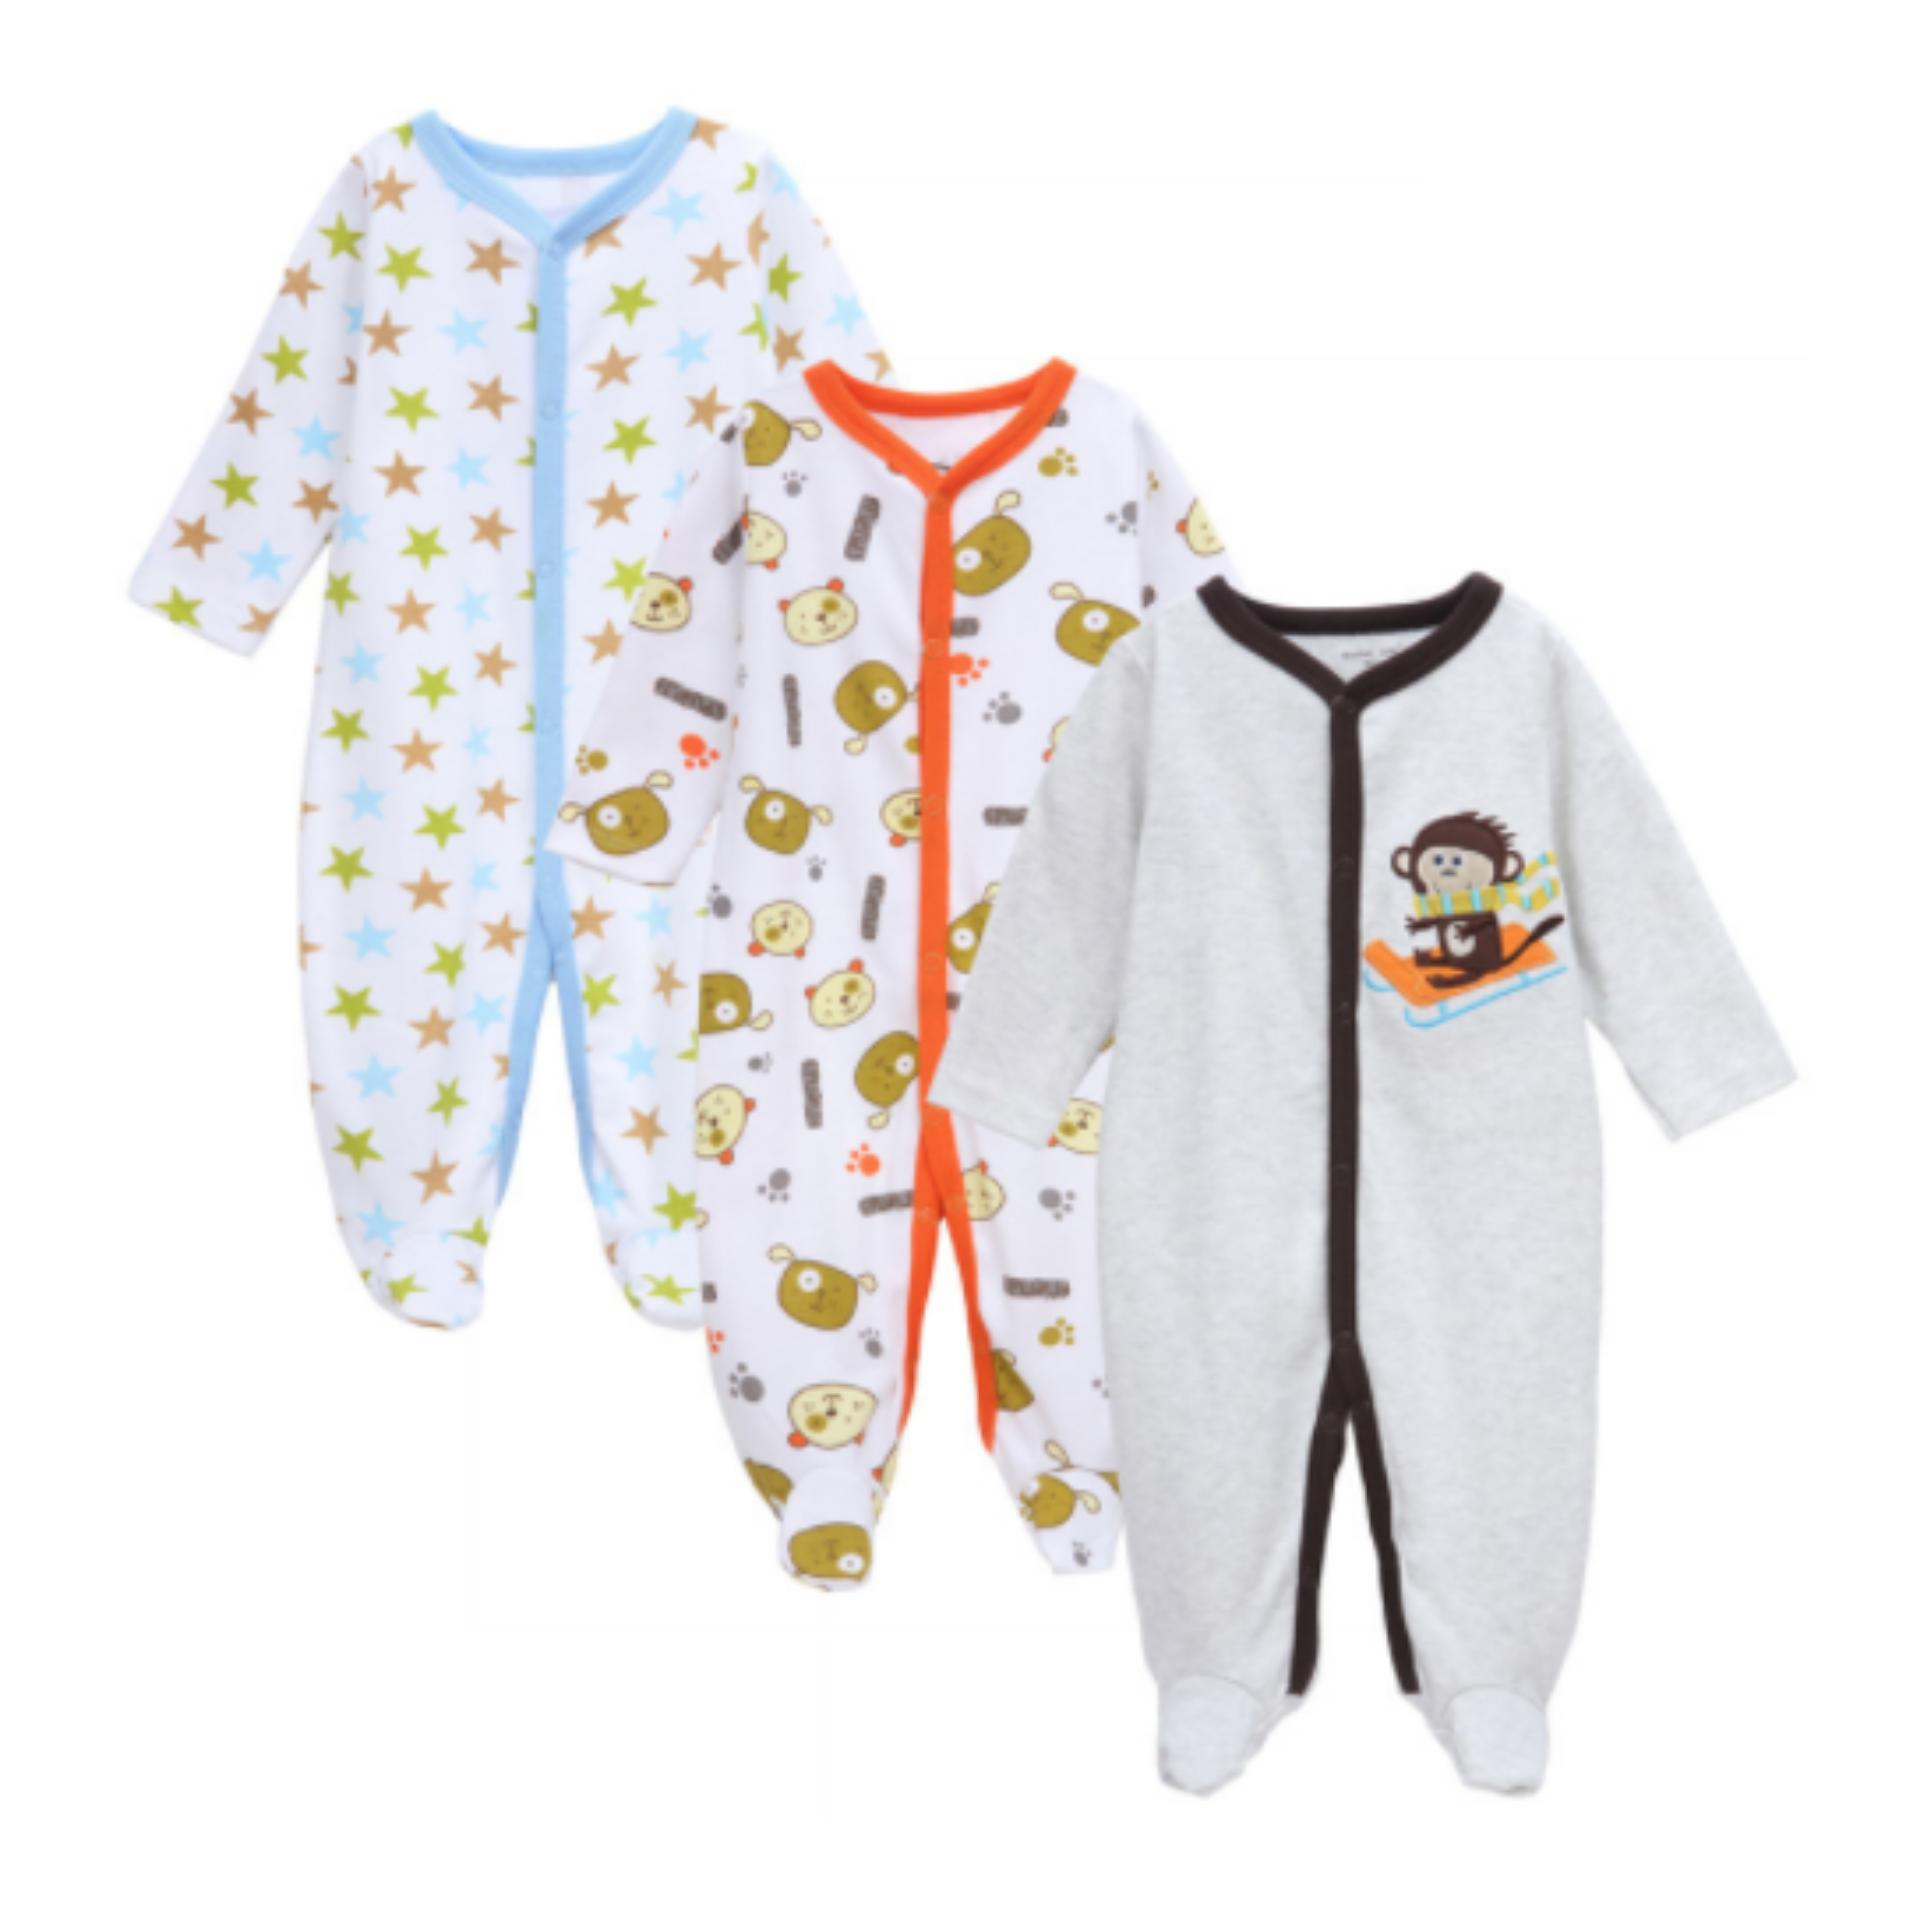 WULANDA rompers nex multiwarna baju kodok bayi jumpsuit overall jamper bayi isi 3 pcs tutup kaki